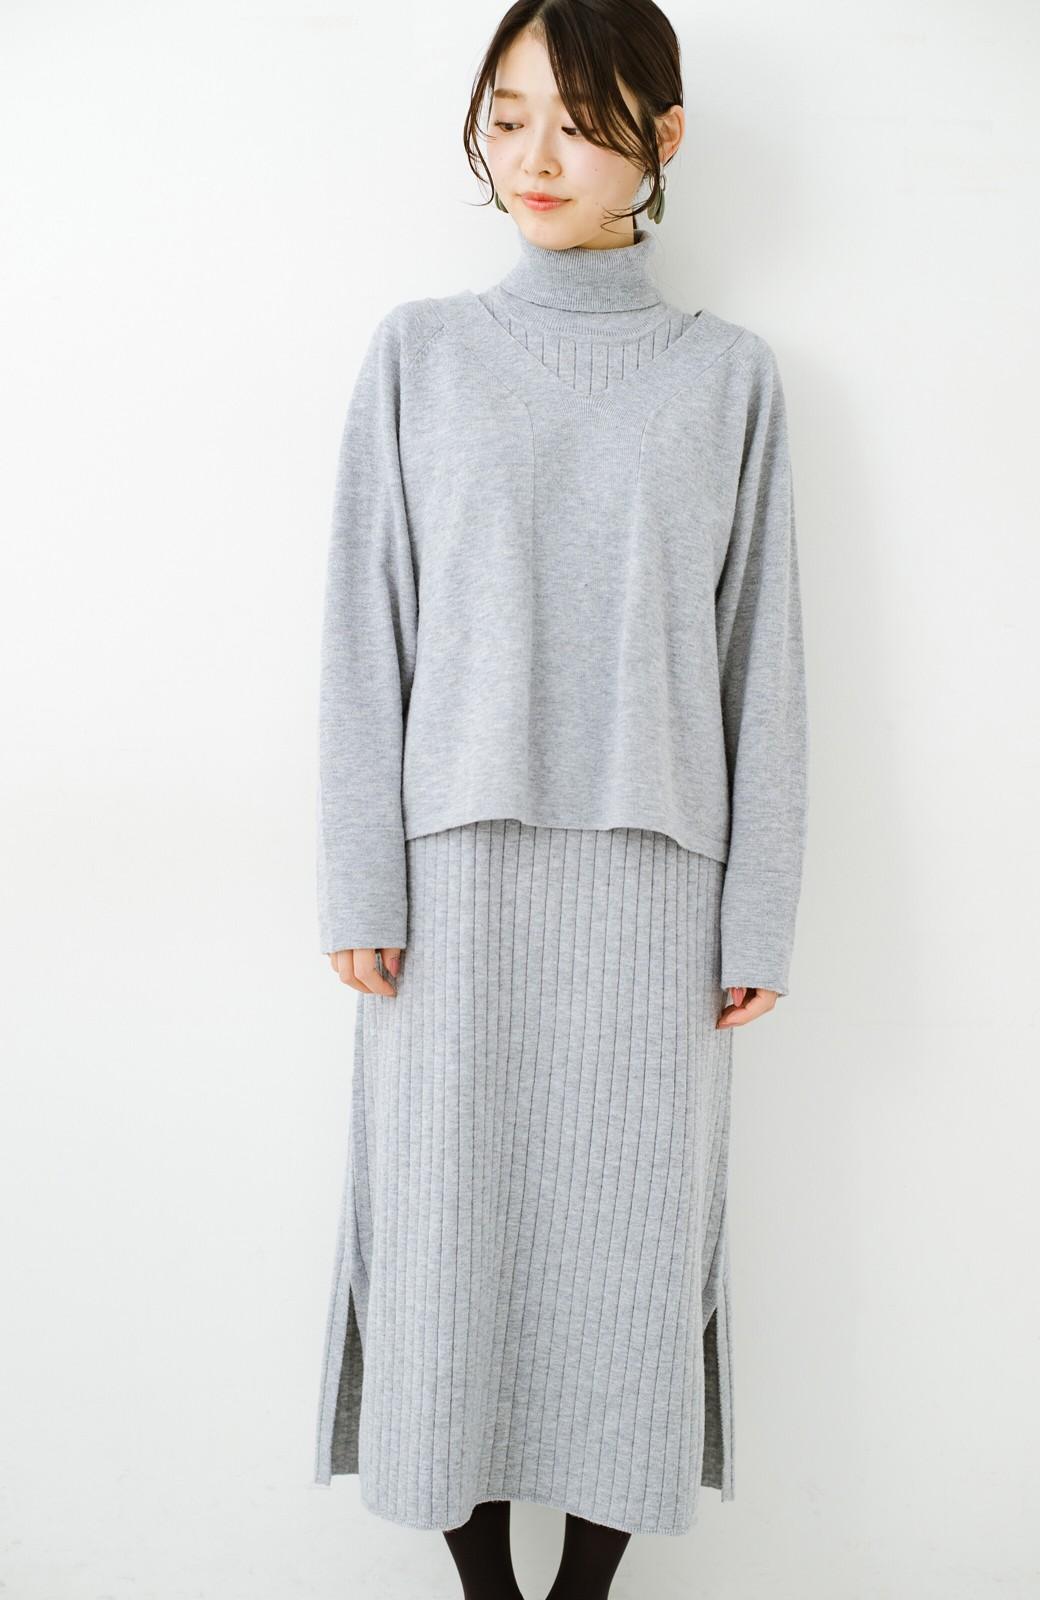 haco! セットで着るだけパッとかわいい ニットトップス&ノースリーブニットワンピースセット <グレー>の商品写真23